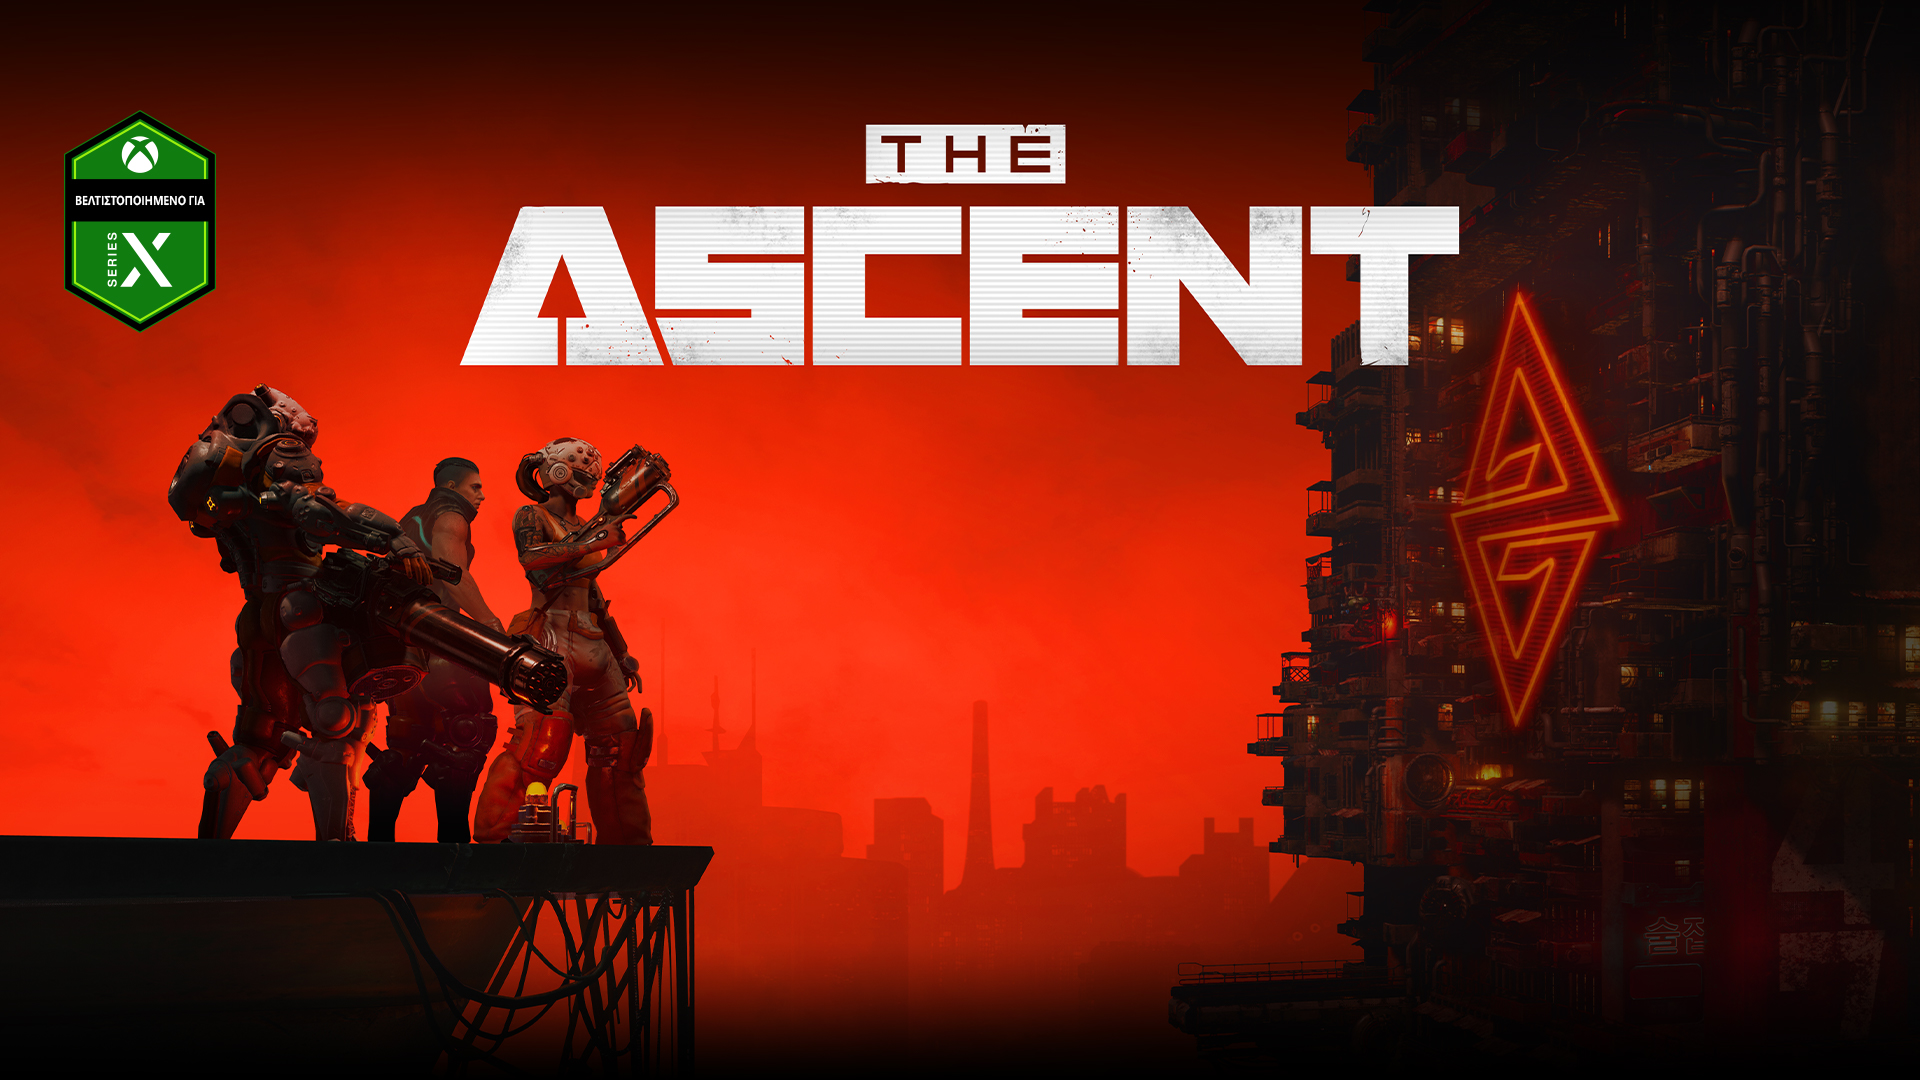 The Ascent, Βελτιστοποιημένο για Xbox Series X, τρεις χαρακτήρες στέκονται πάνω σε μια πλατφόρμα με θέα σε ένα μεγάλο βιομηχανικό κτίριο σε στυλ cyberpunk